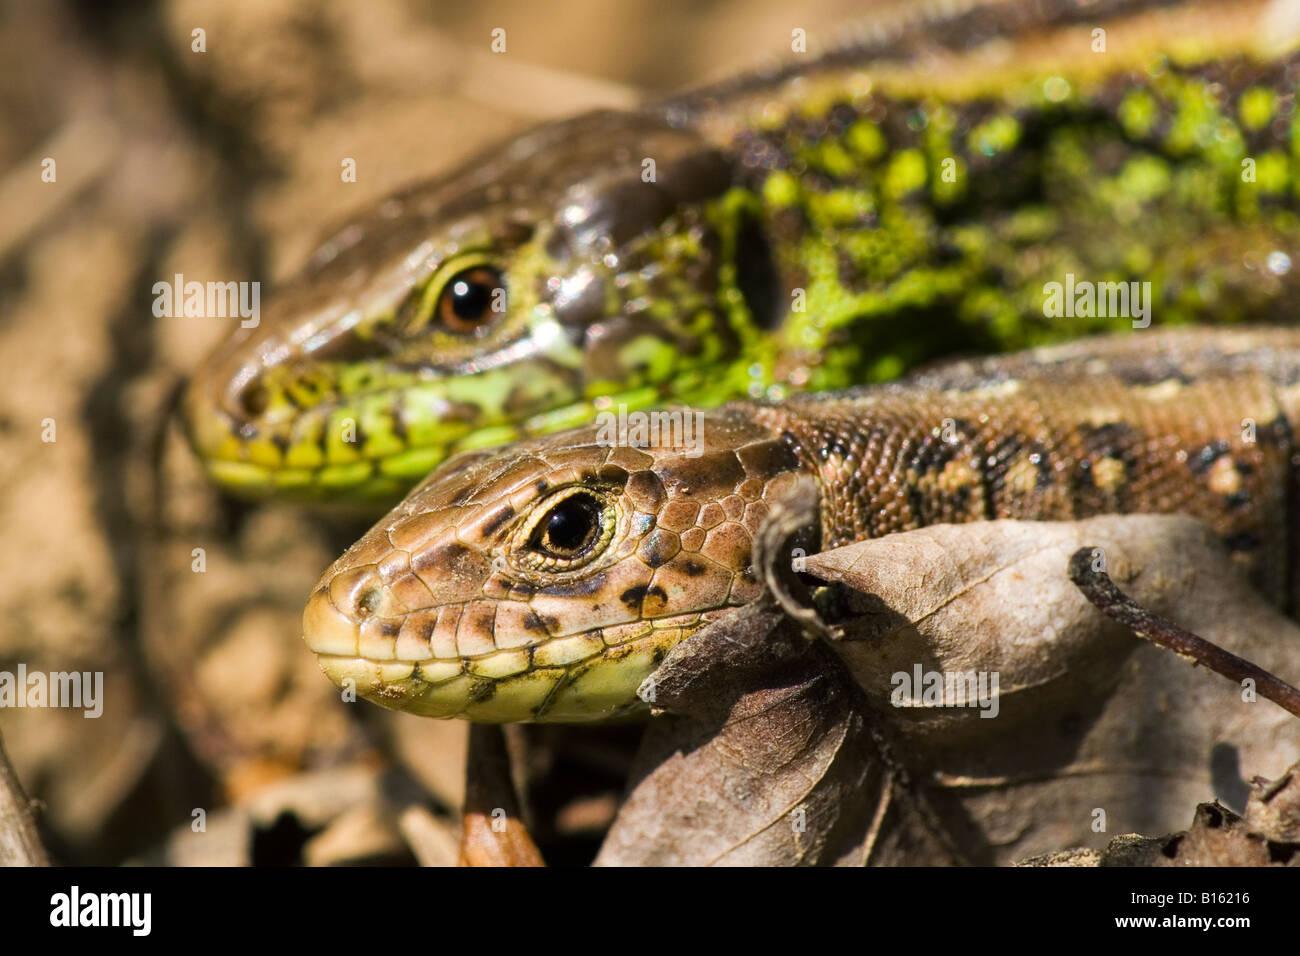 A couple of sand lizards sunbathing. - Stock Image